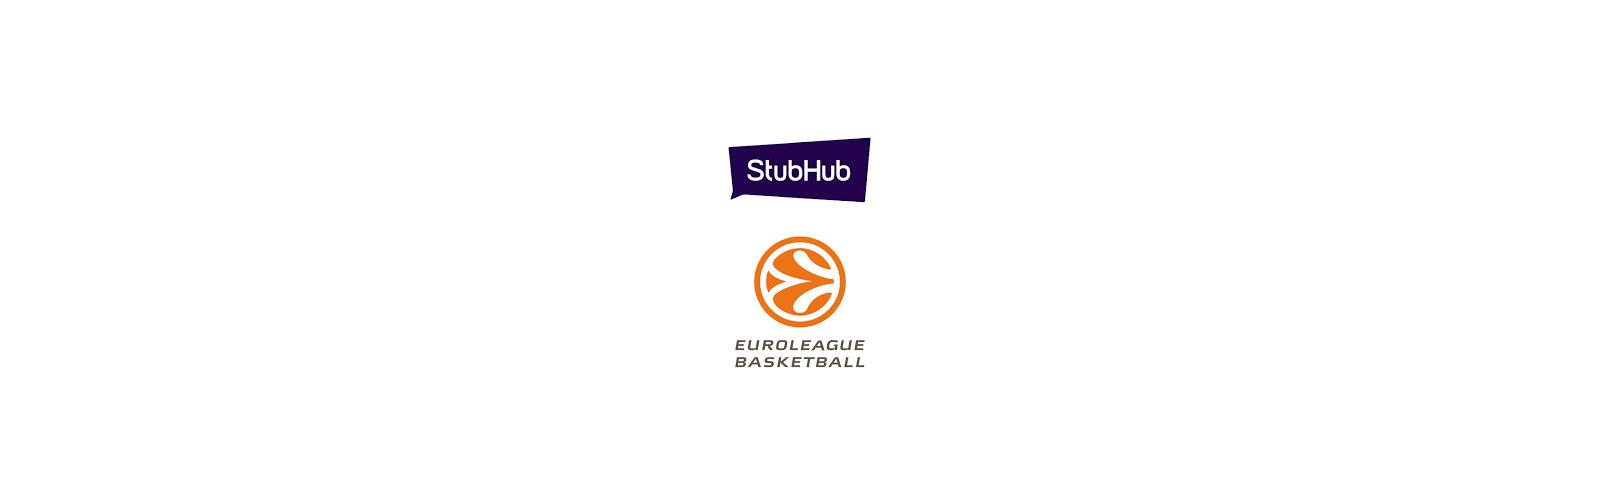 stubhub-euroleague-basketball